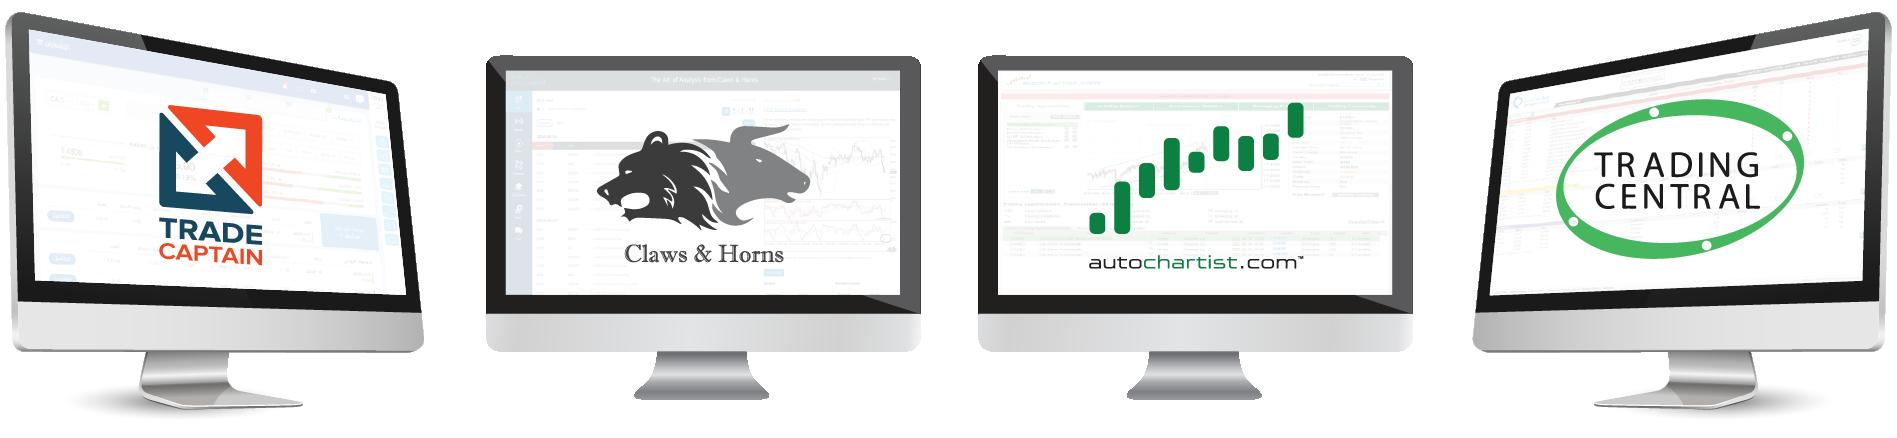 Amana Technical Trading Tools